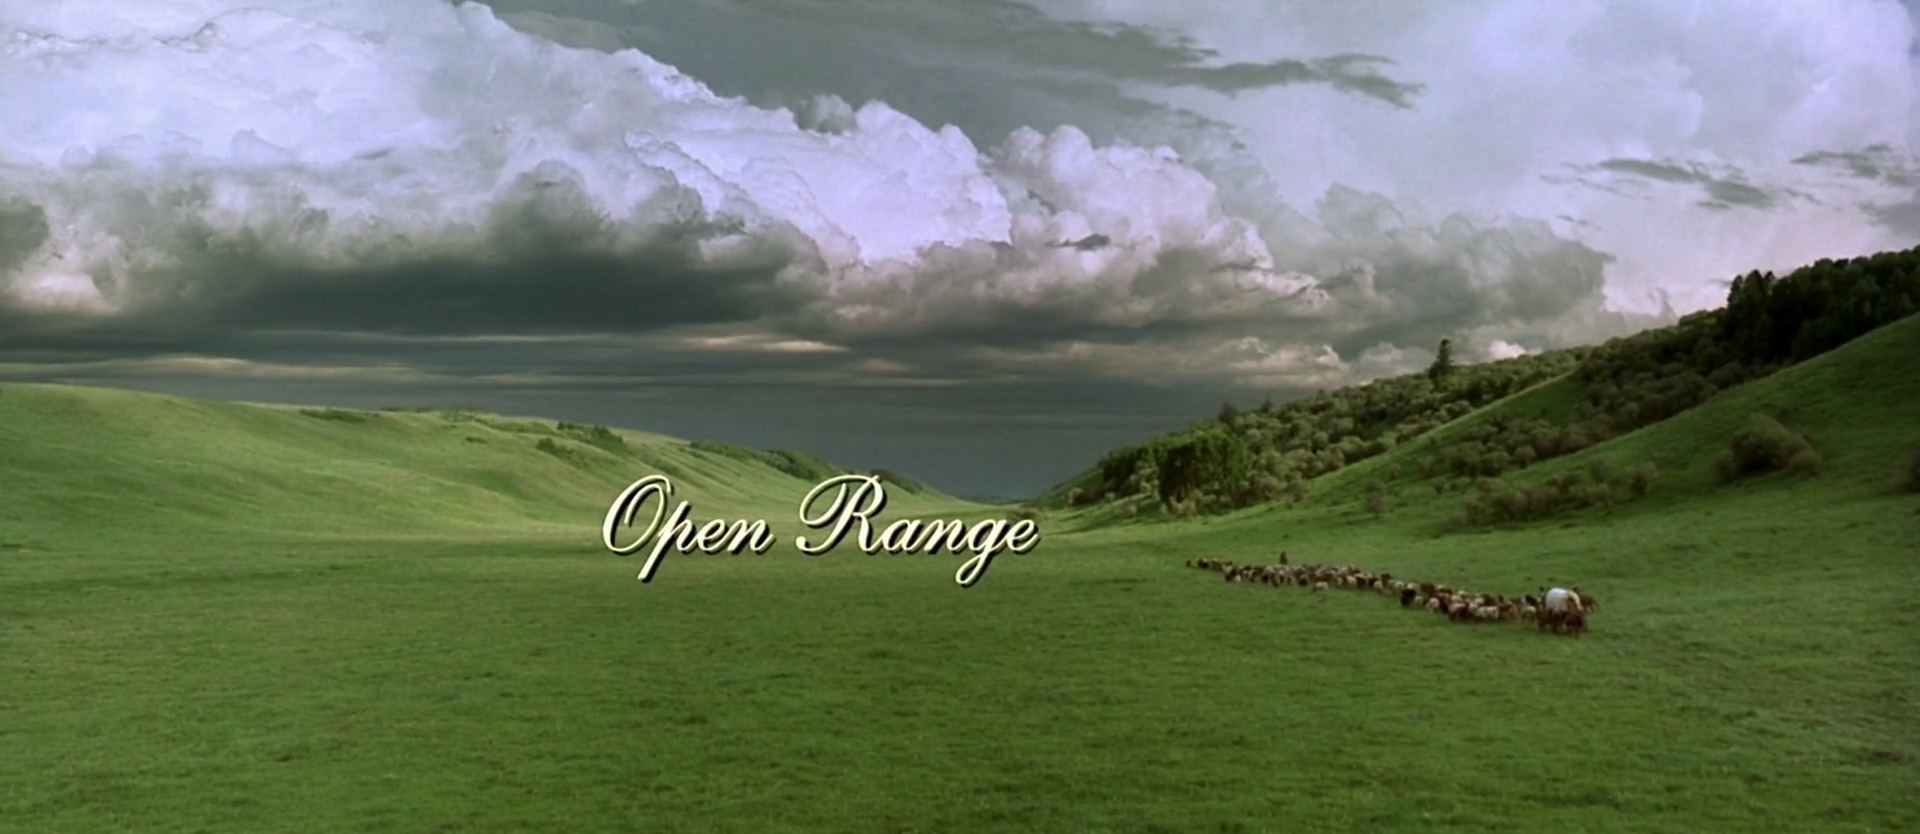 OPEN RANGE de Kevin Costner (2003)